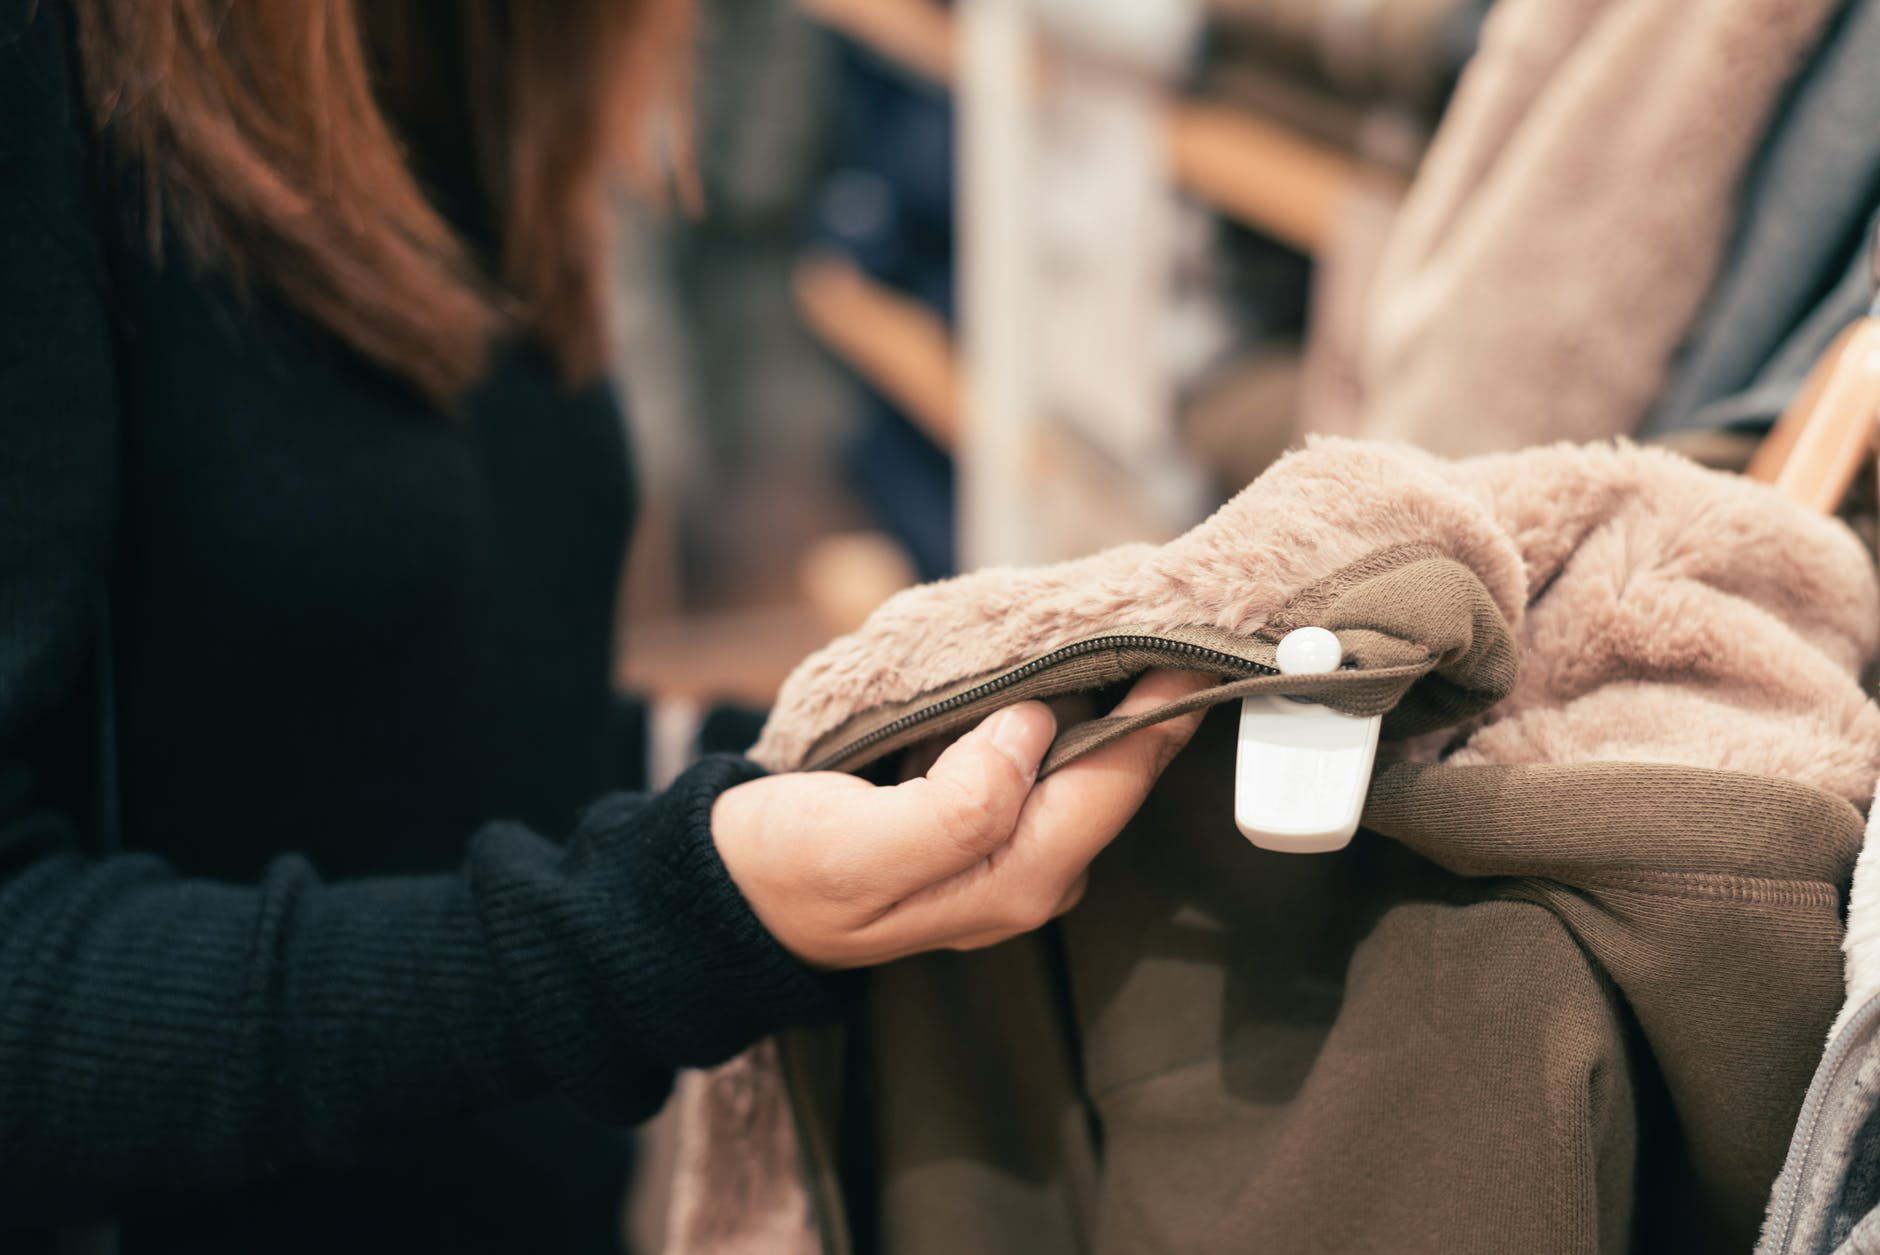 Kualitas produk: faktor kepuasan pelanggan